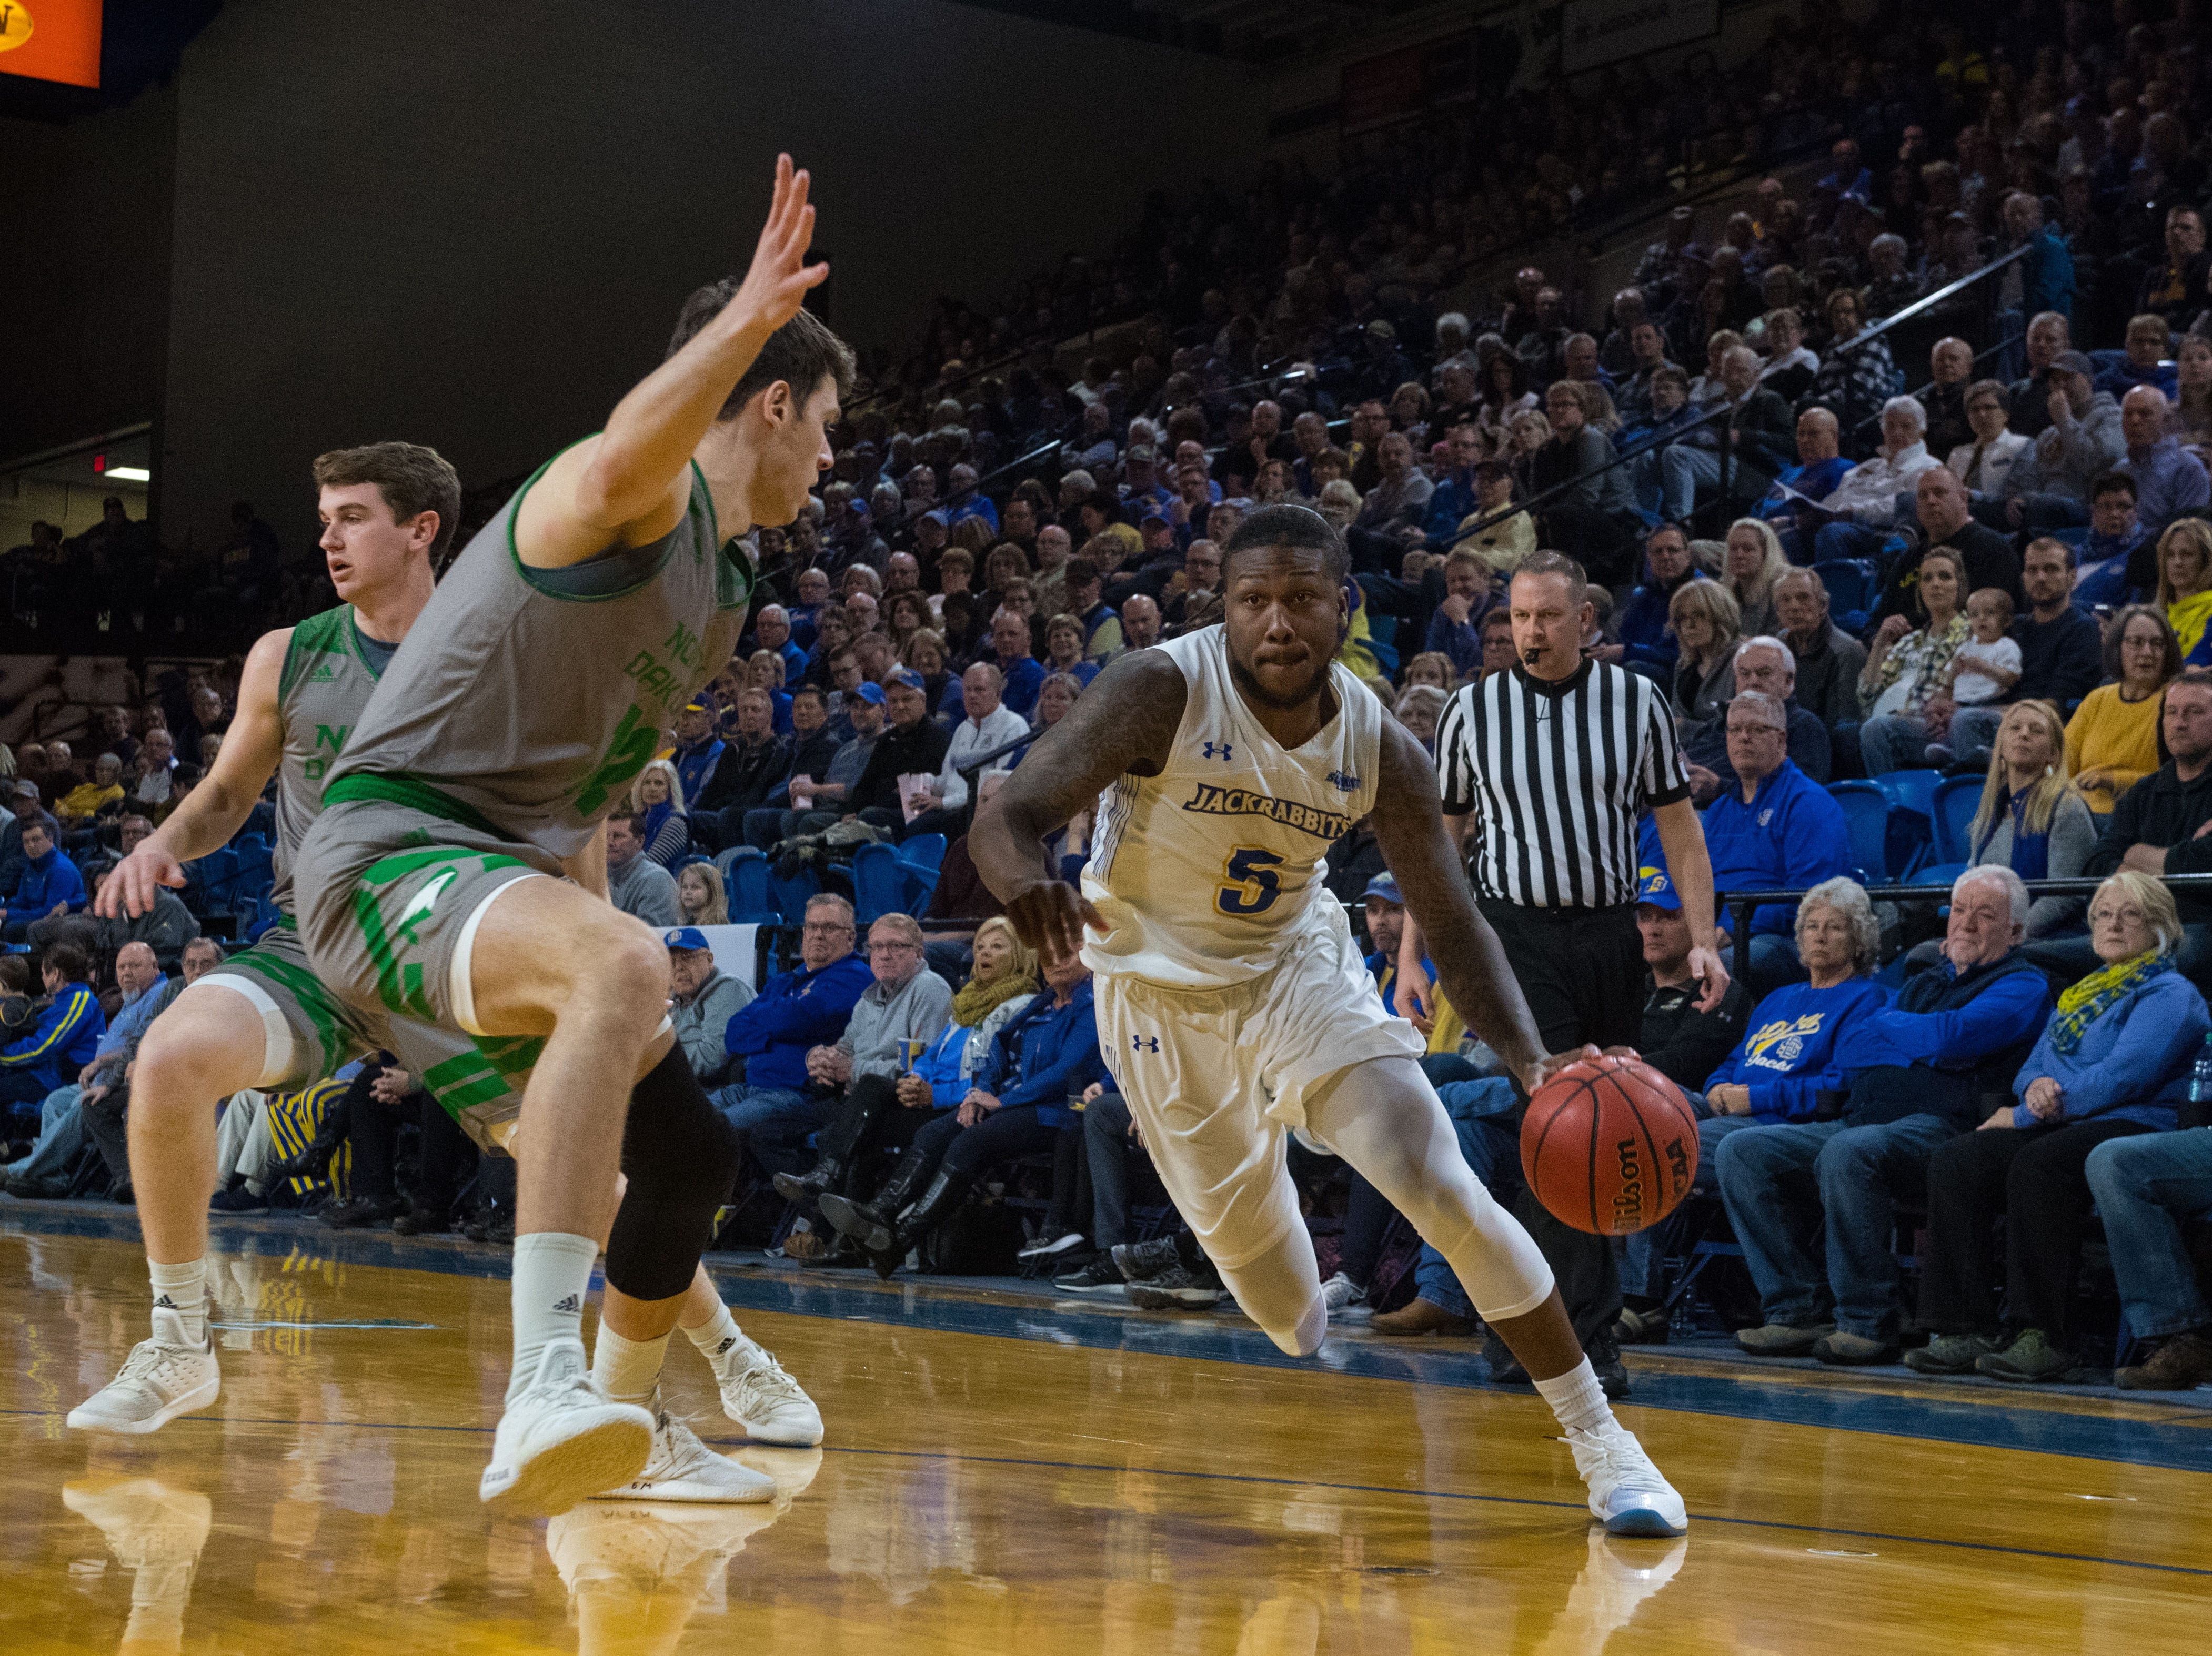 South Dakota State's David Jenkins (5) dribbles the ball past North Dakota player during a game in Brookings, S.D., Saturday, Feb. 9, 2019.